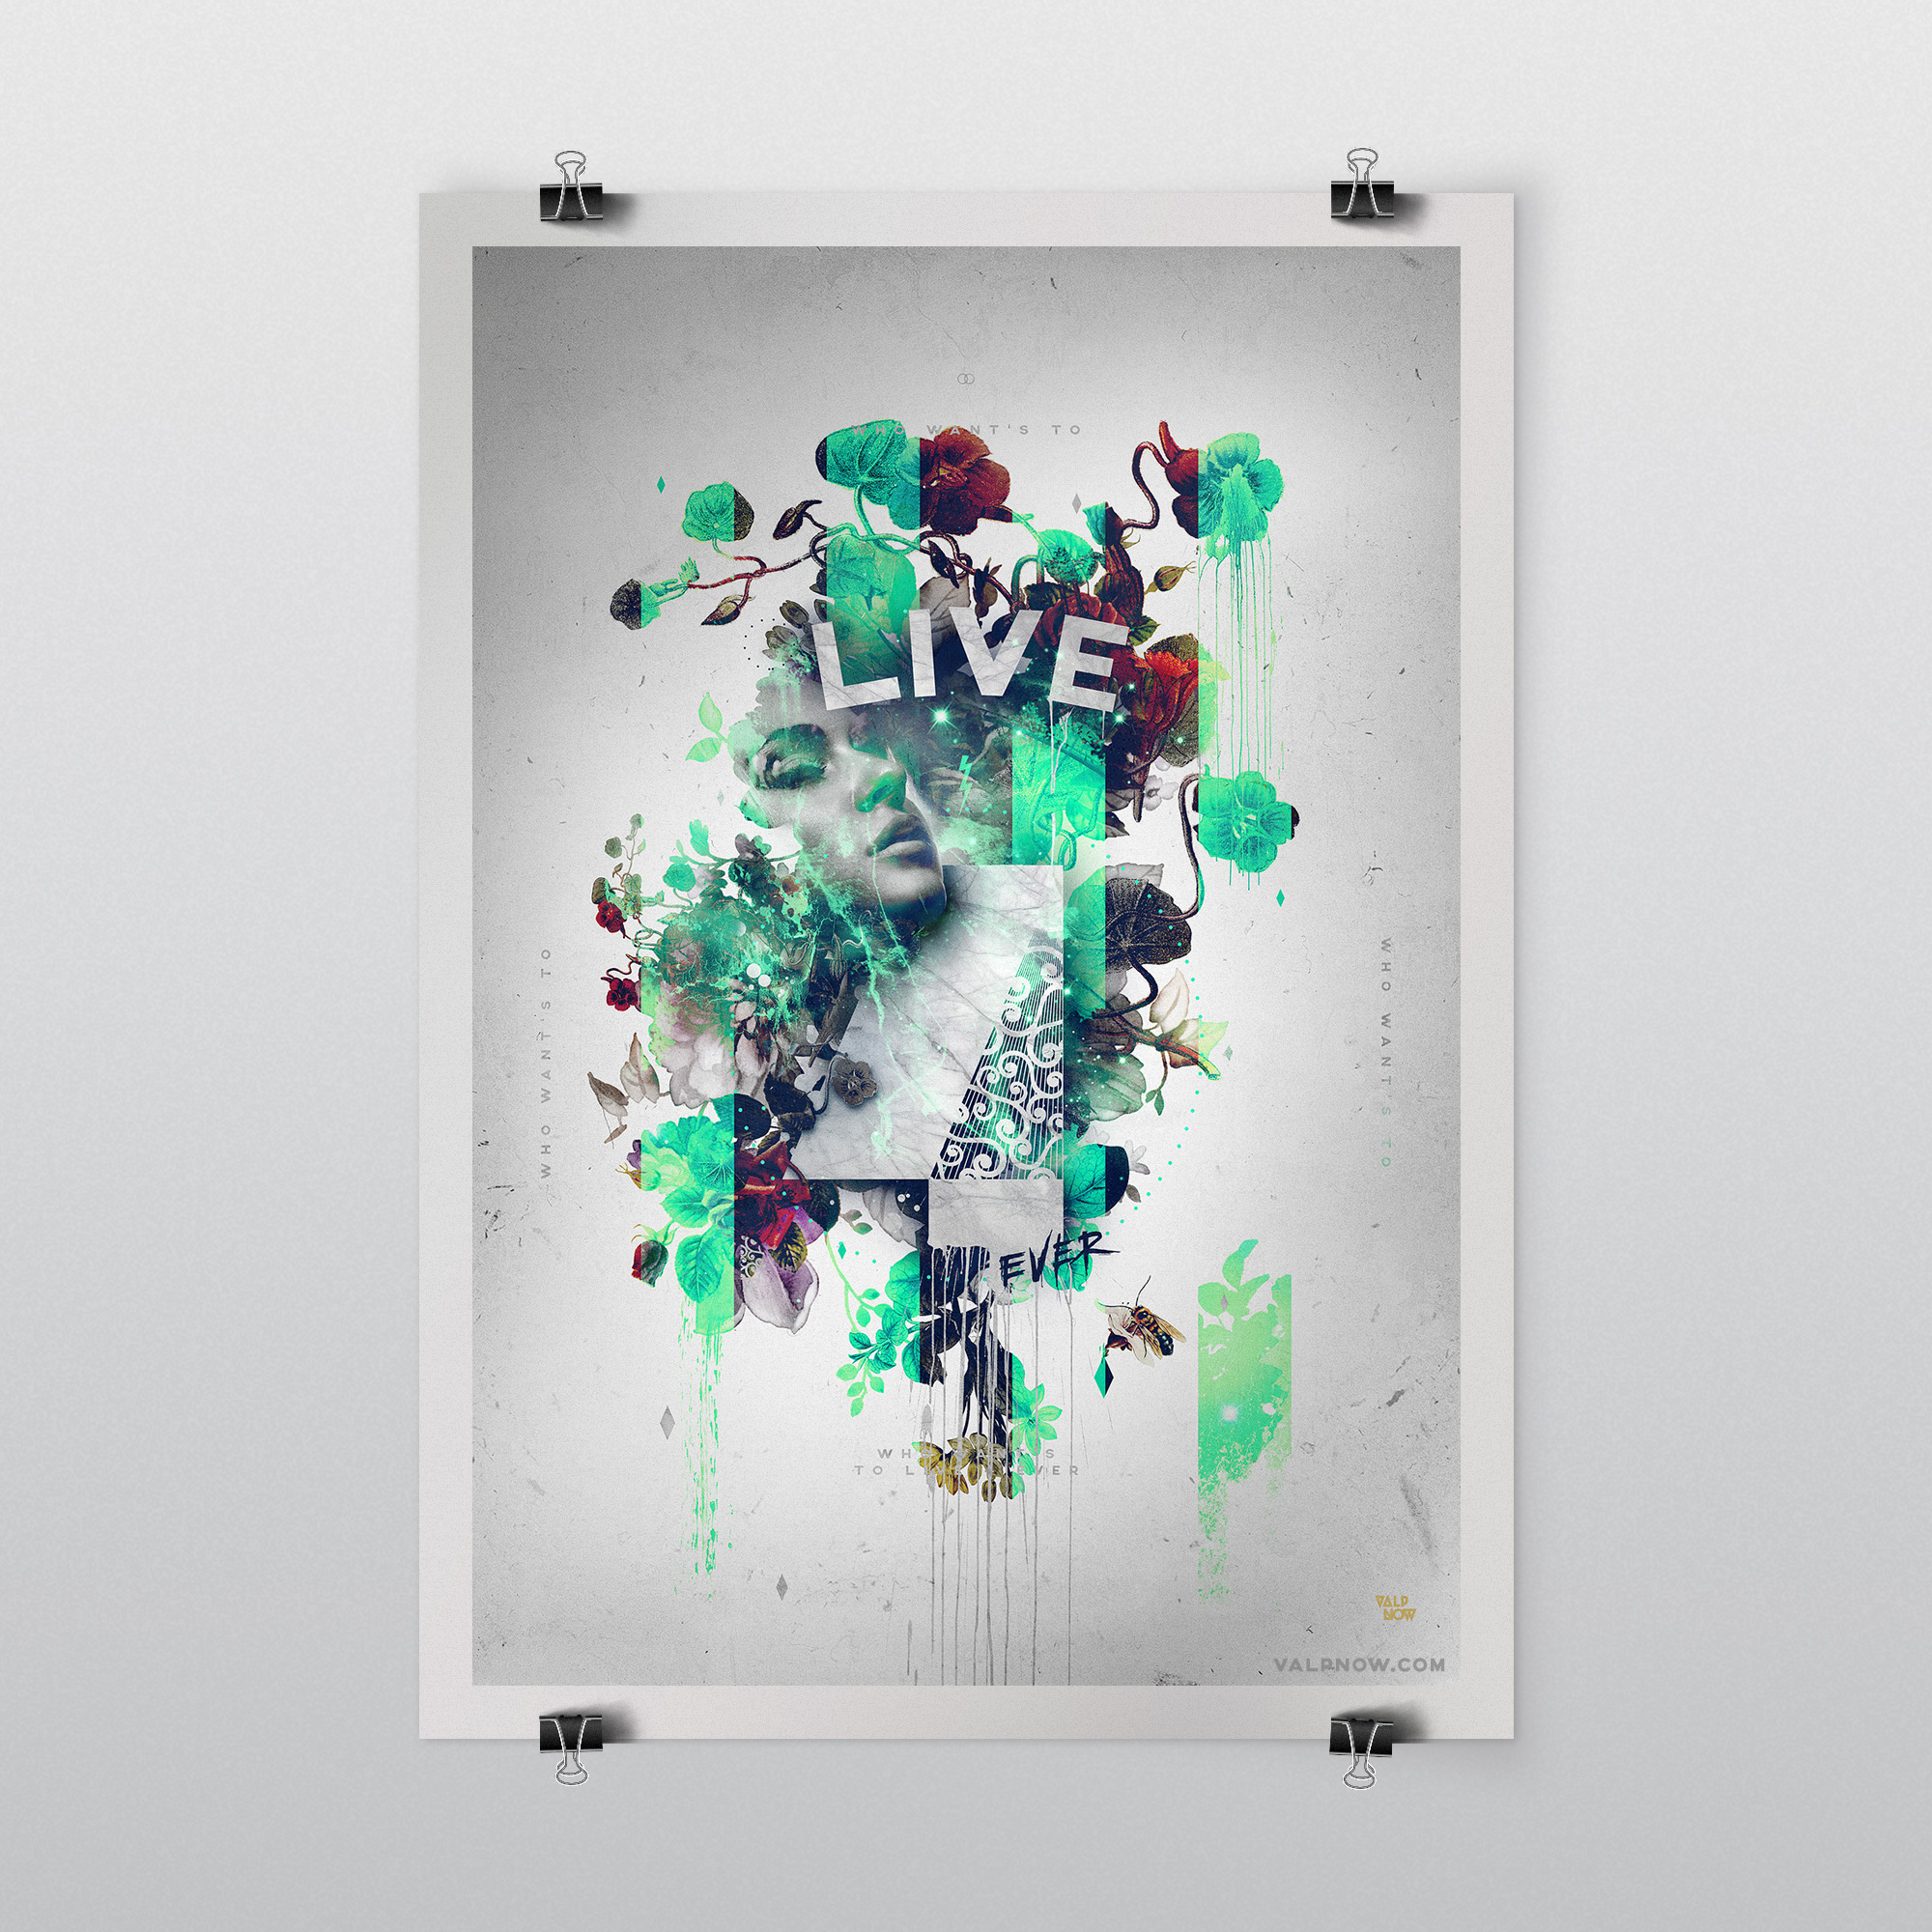 Valp - Live 4ever (mockup).jpg